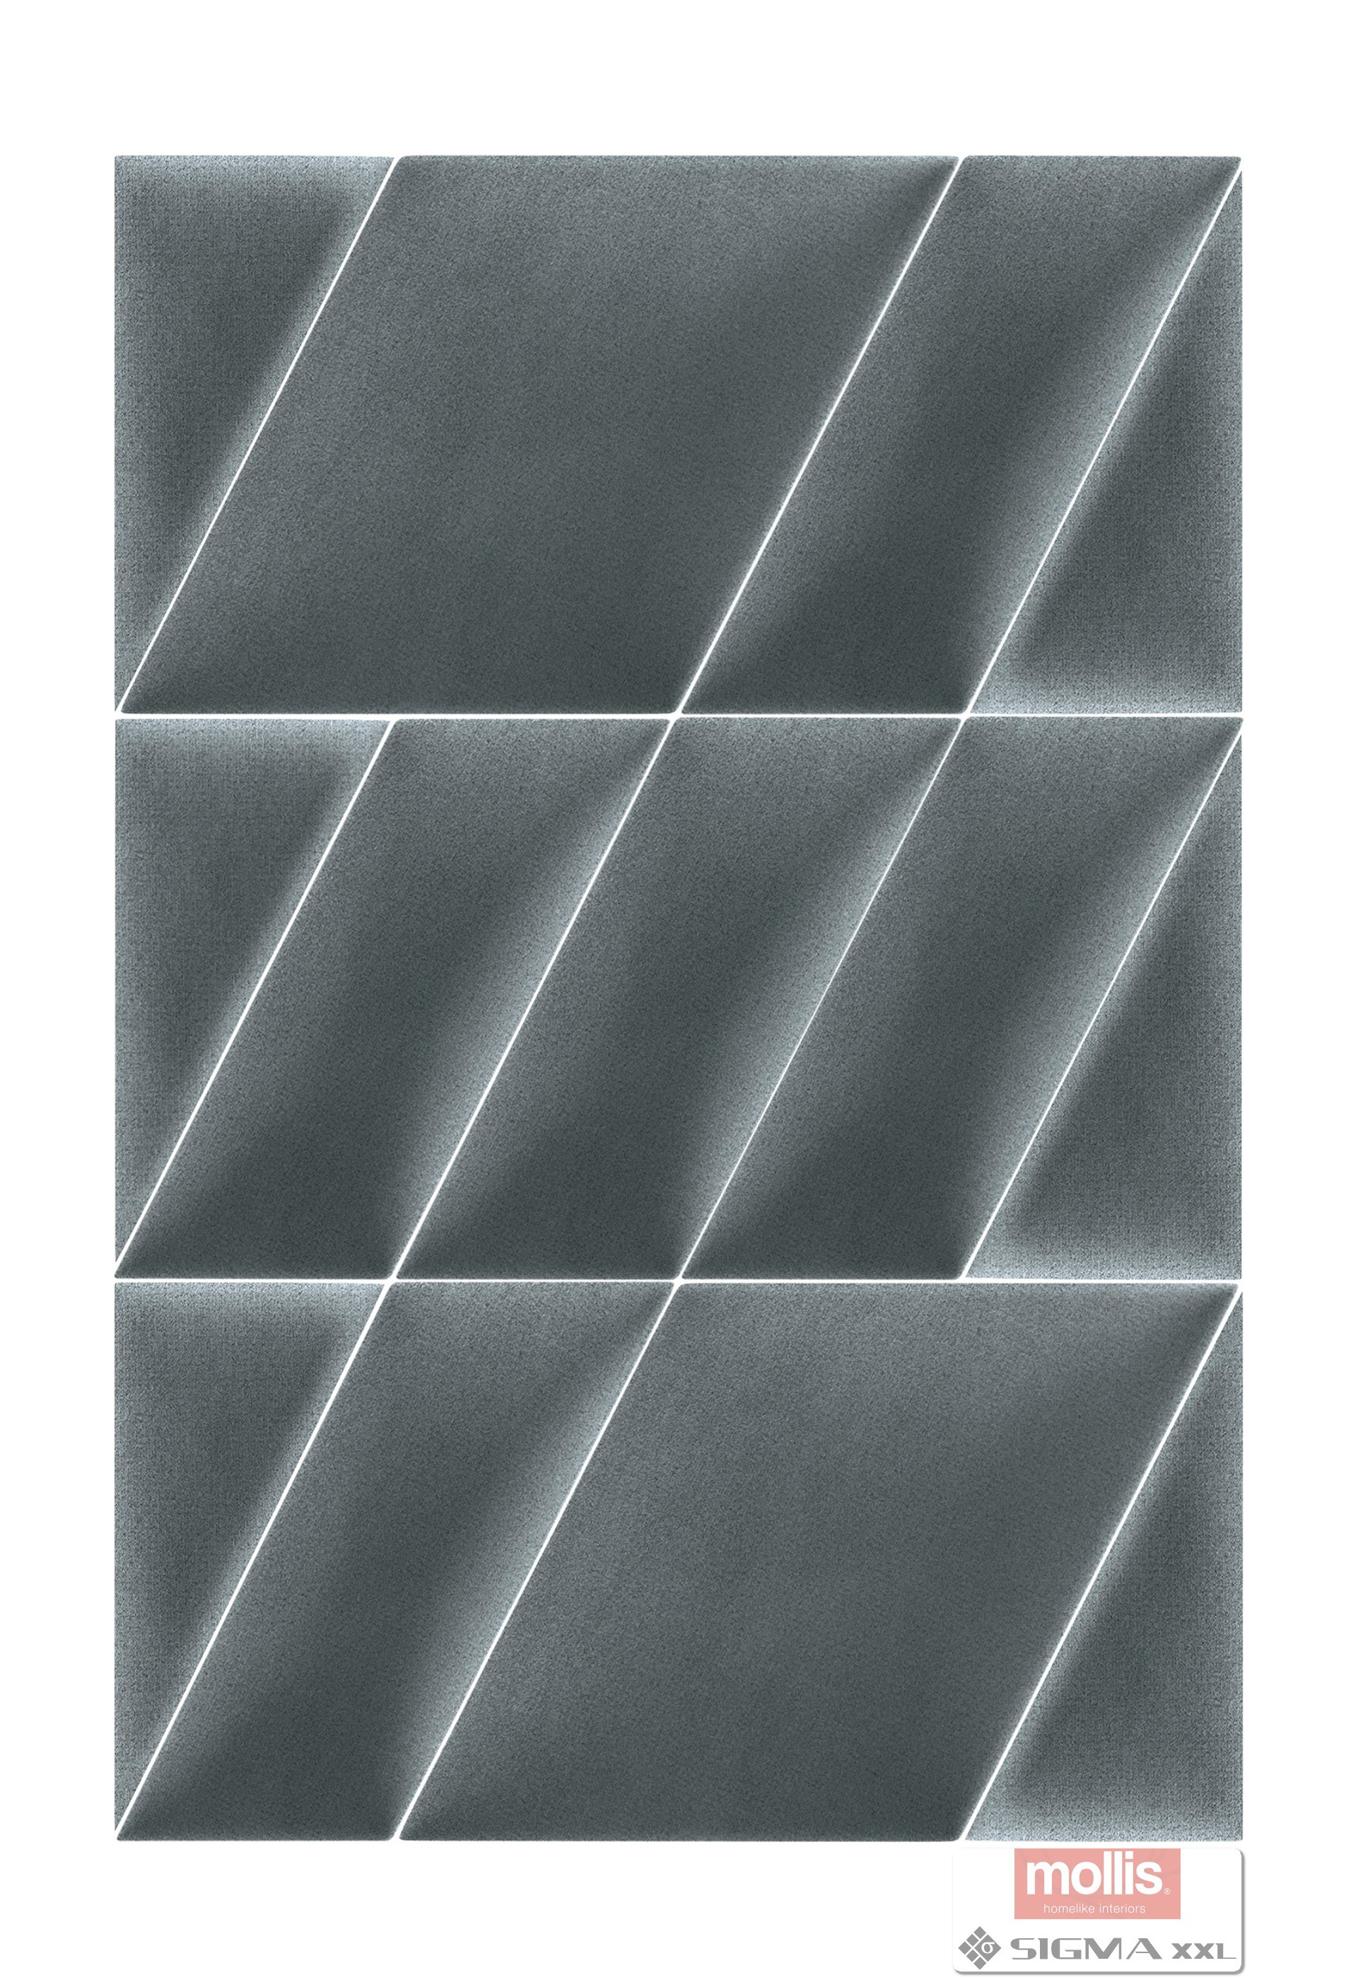 Imagine Mollis Abies 02 Dark Storm (Paralelogram B - 30x15 cm)